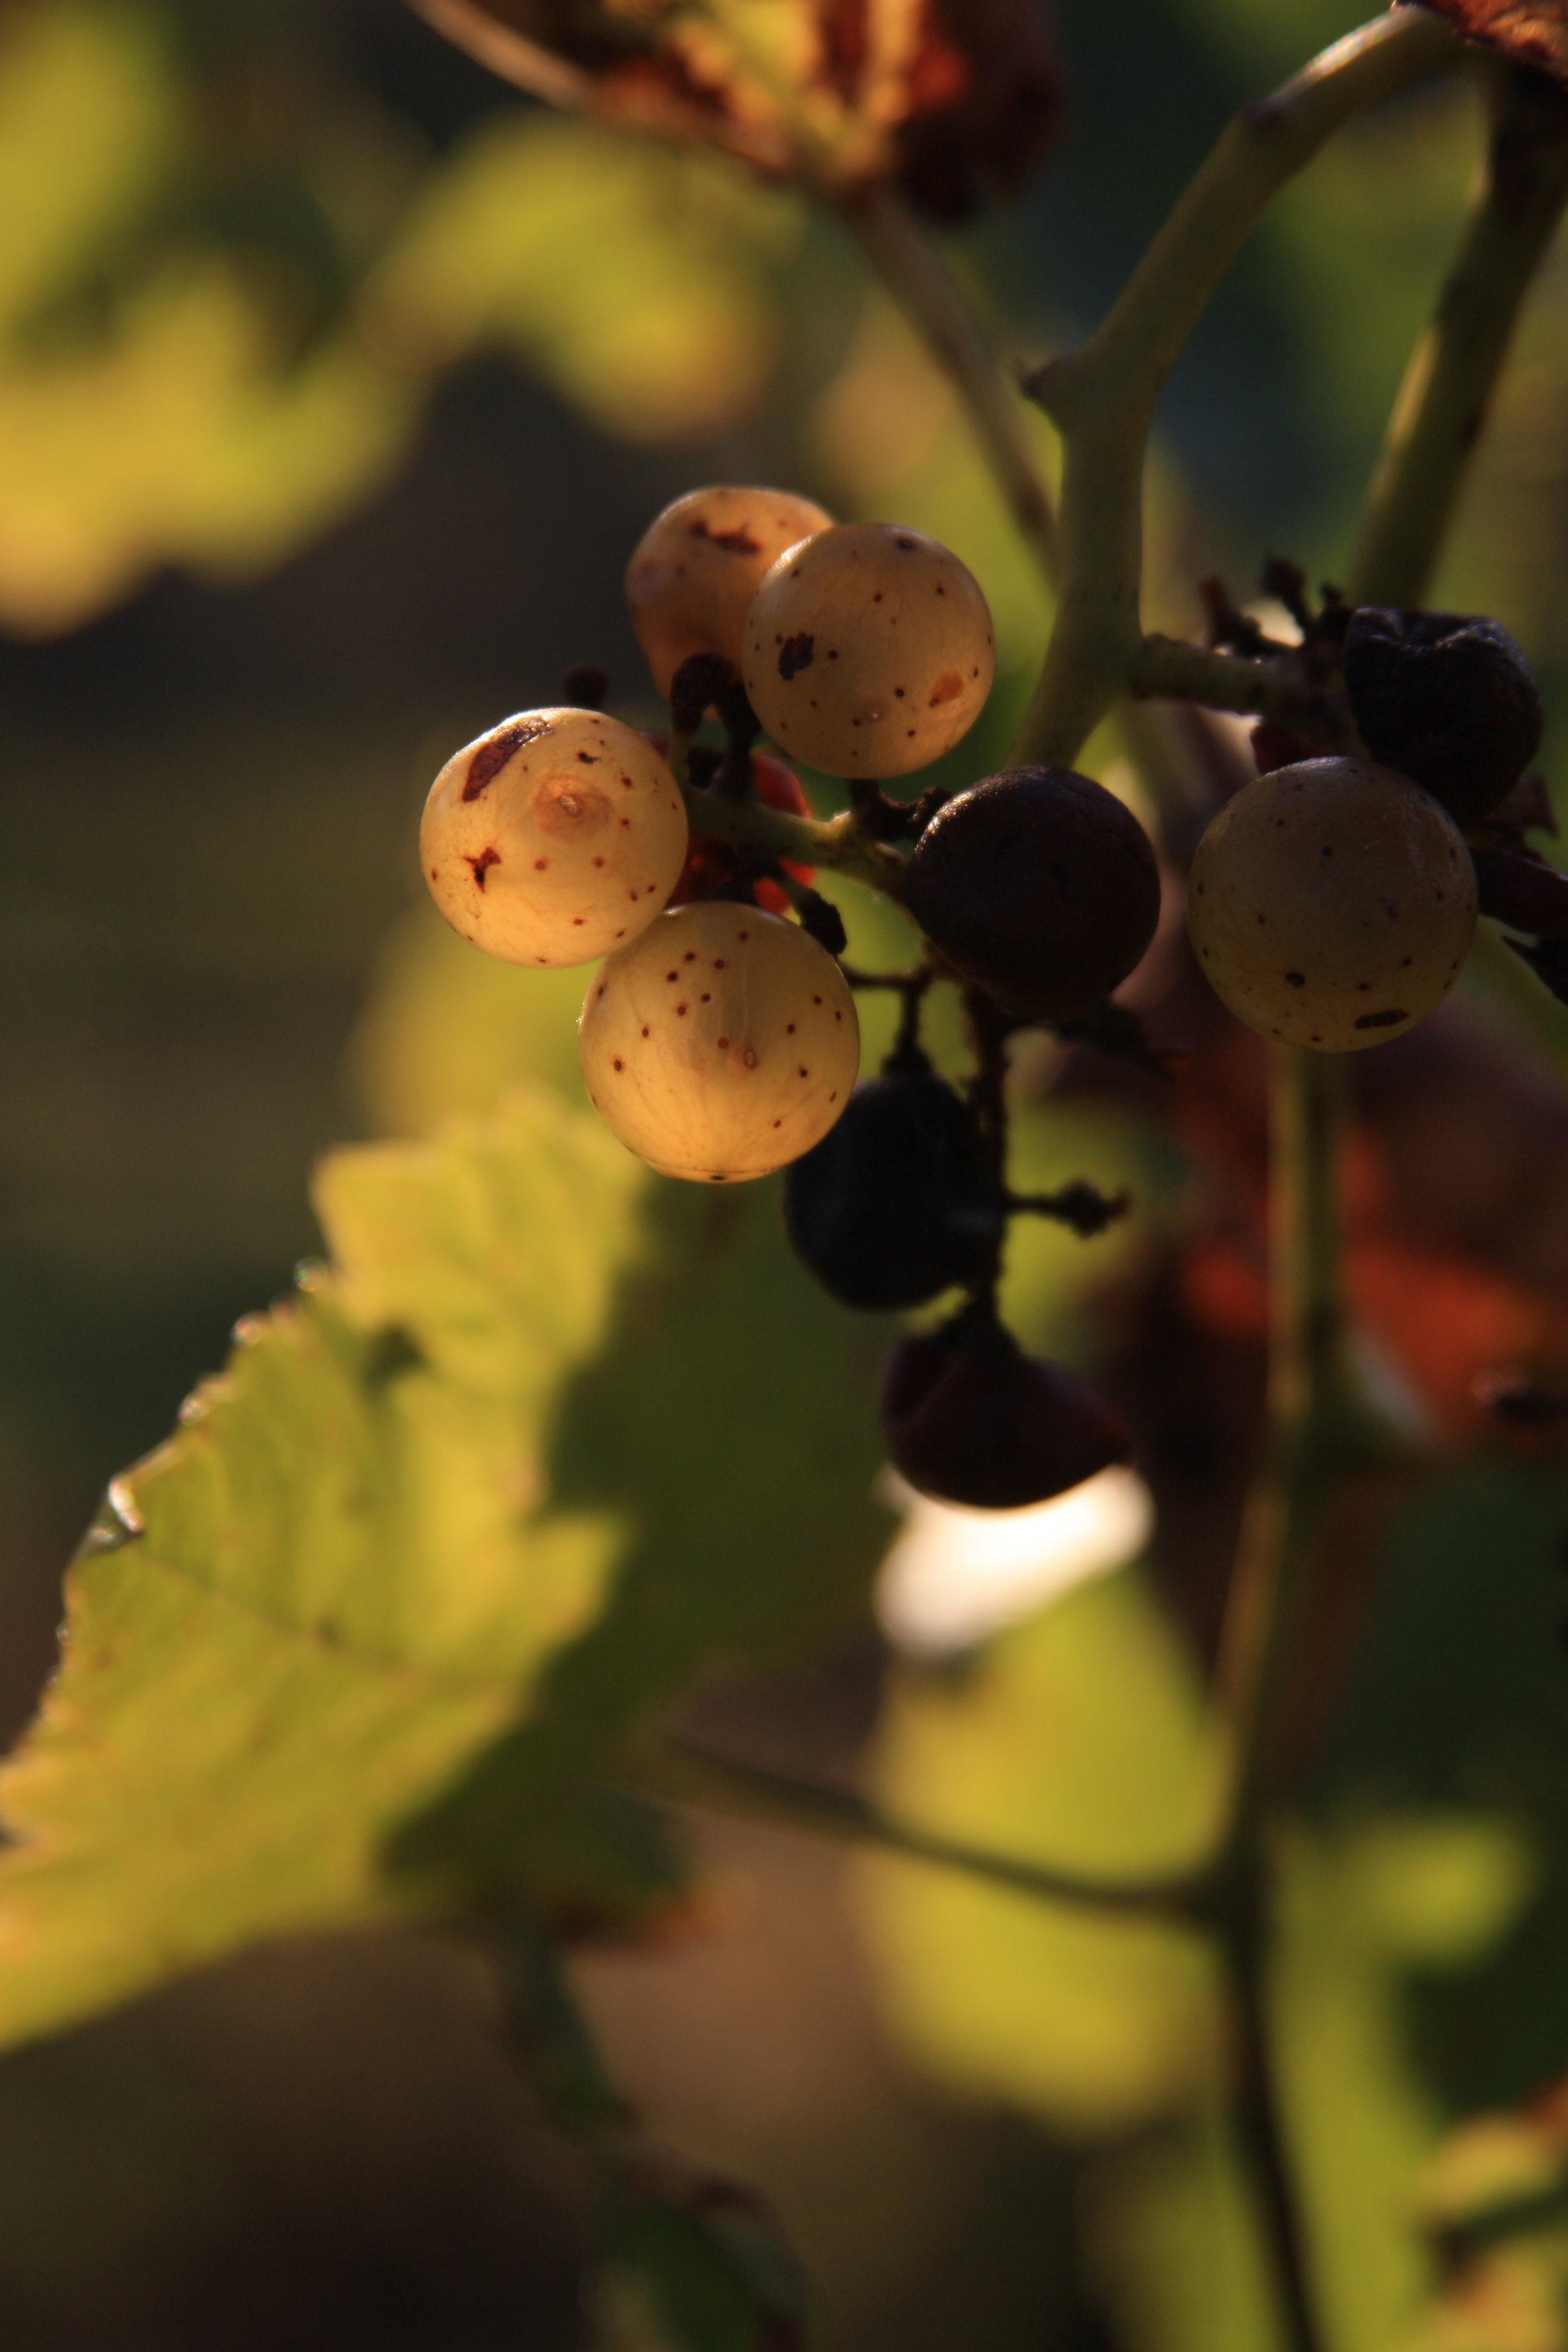 estate-grown - Each vintage brings more interesting fruit than the last.